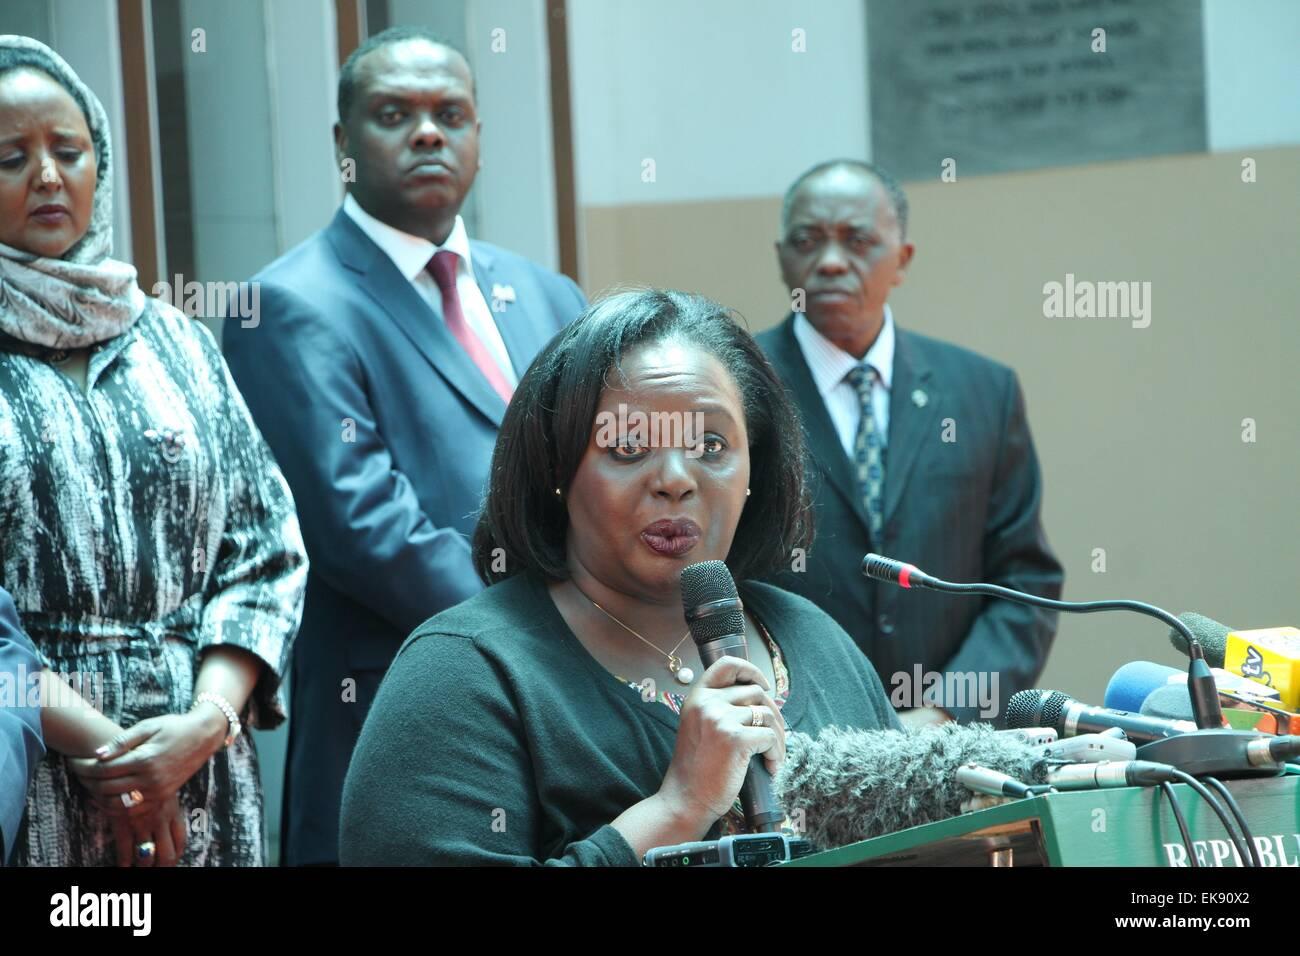 Nairobi, Kenya. 8th Apr, 2015. Kenya's Defense Cabinet Secretary Rachael Omamo (front) speaks during a press - Stock Image